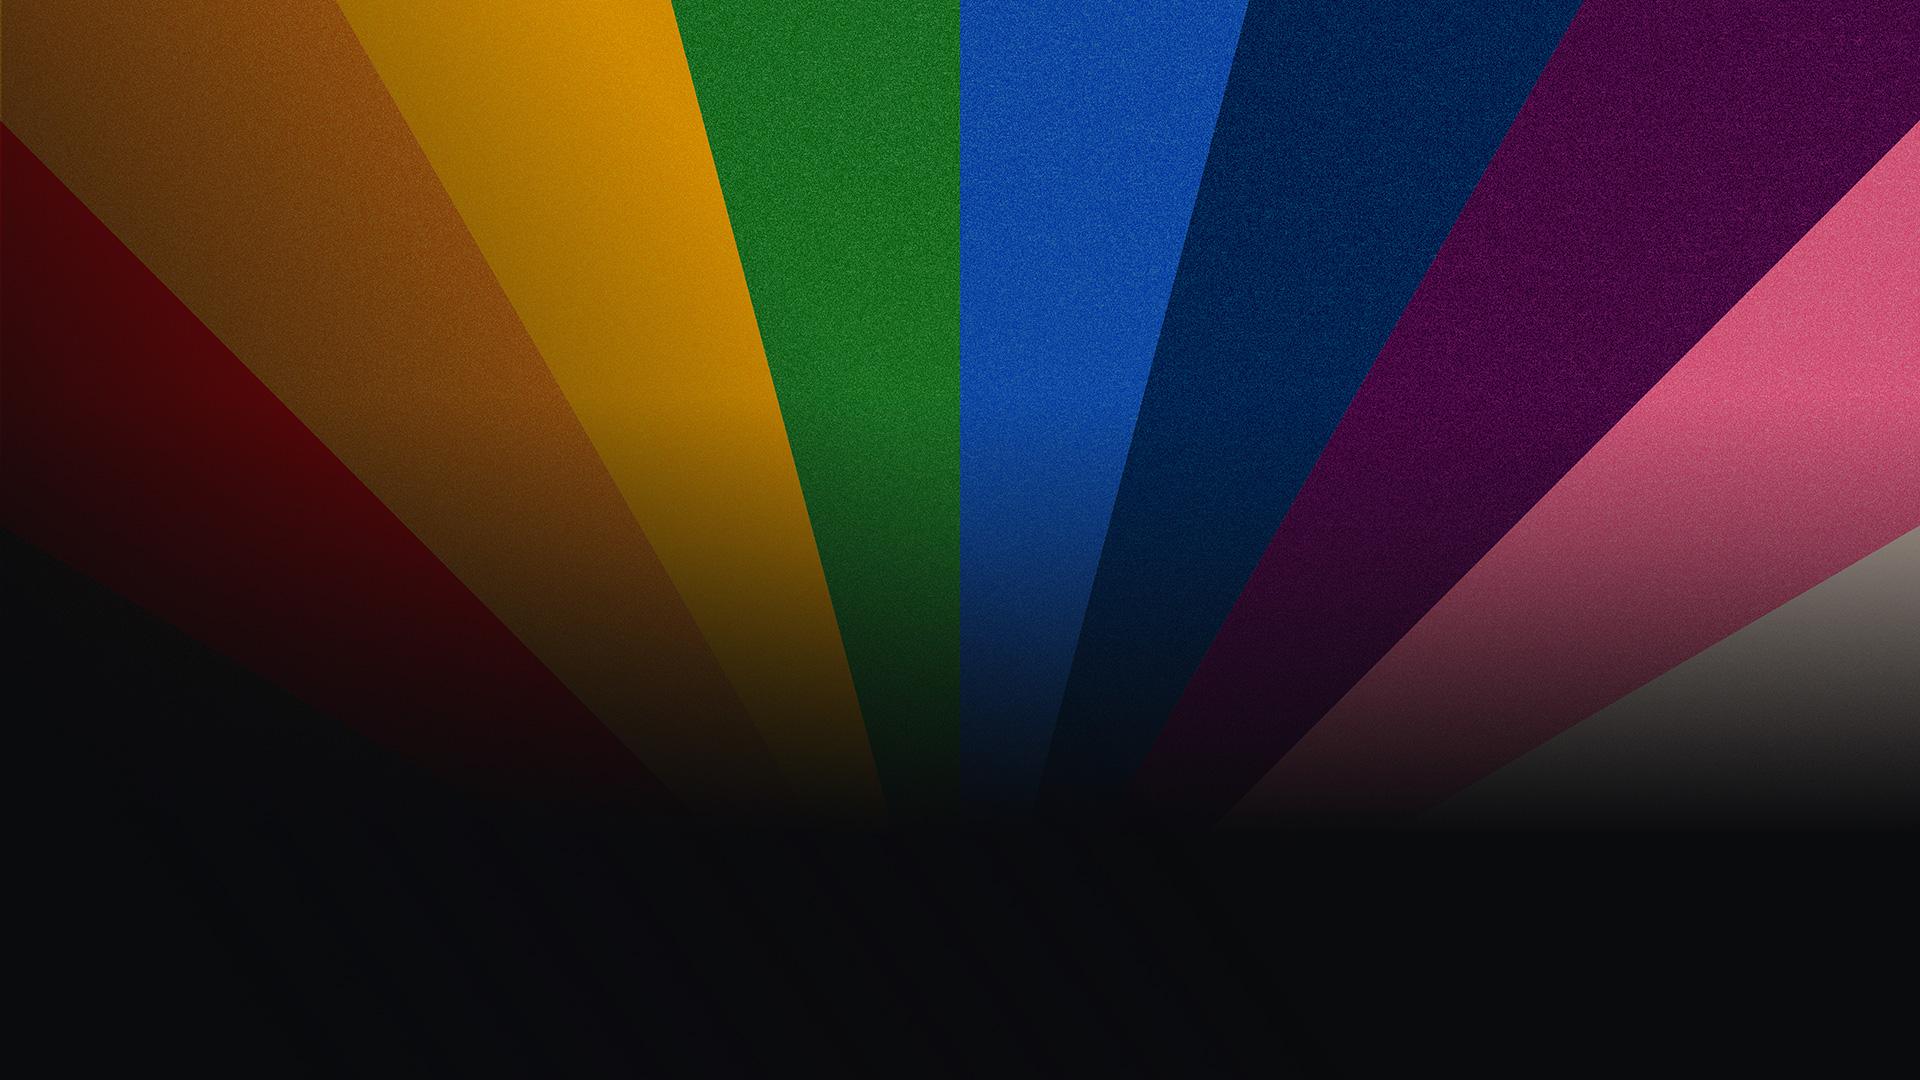 Background Image Celebrating Pride